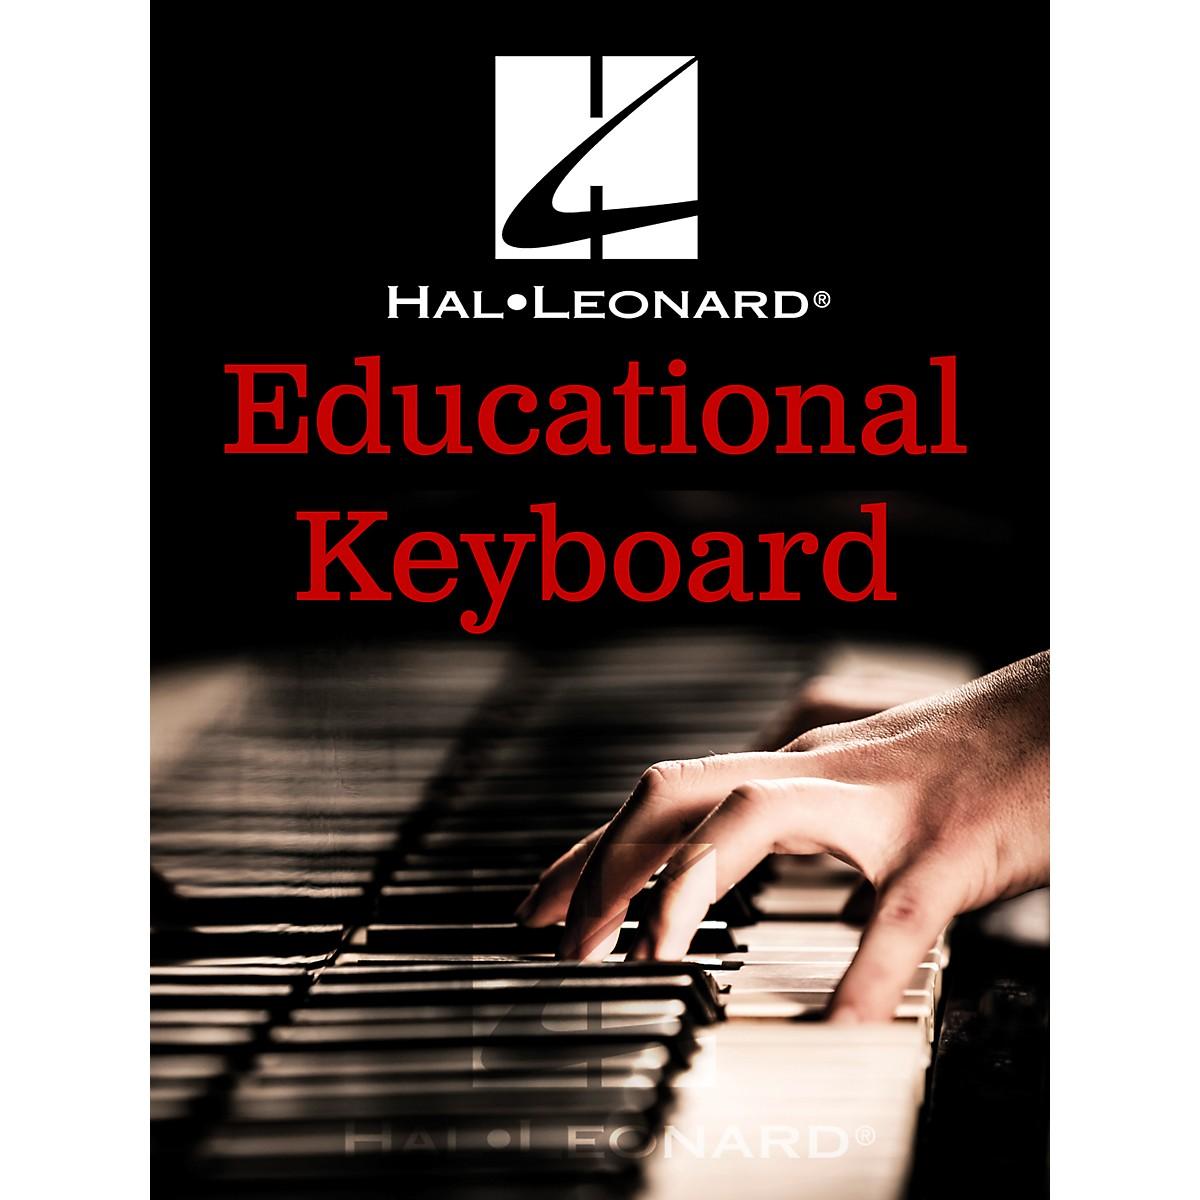 Hal Leonard Jazz Chord Progressions Piano Method Series Written by Bill Boyd